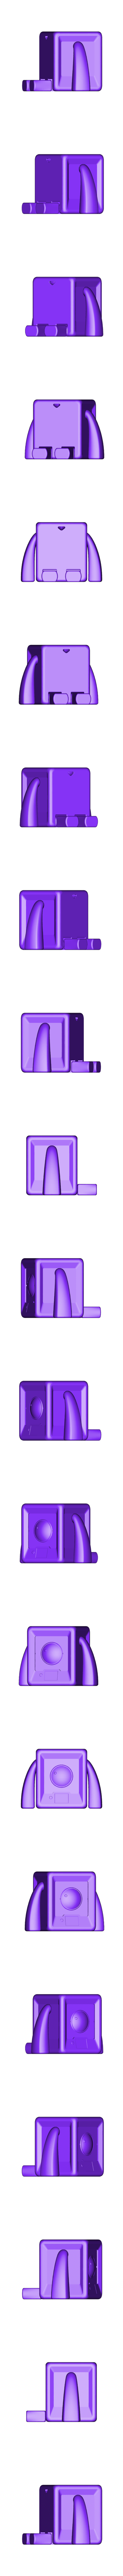 StratoBot2.stl Download free STL file StratoBot Stratomaker • 3D printing design, Skaternine